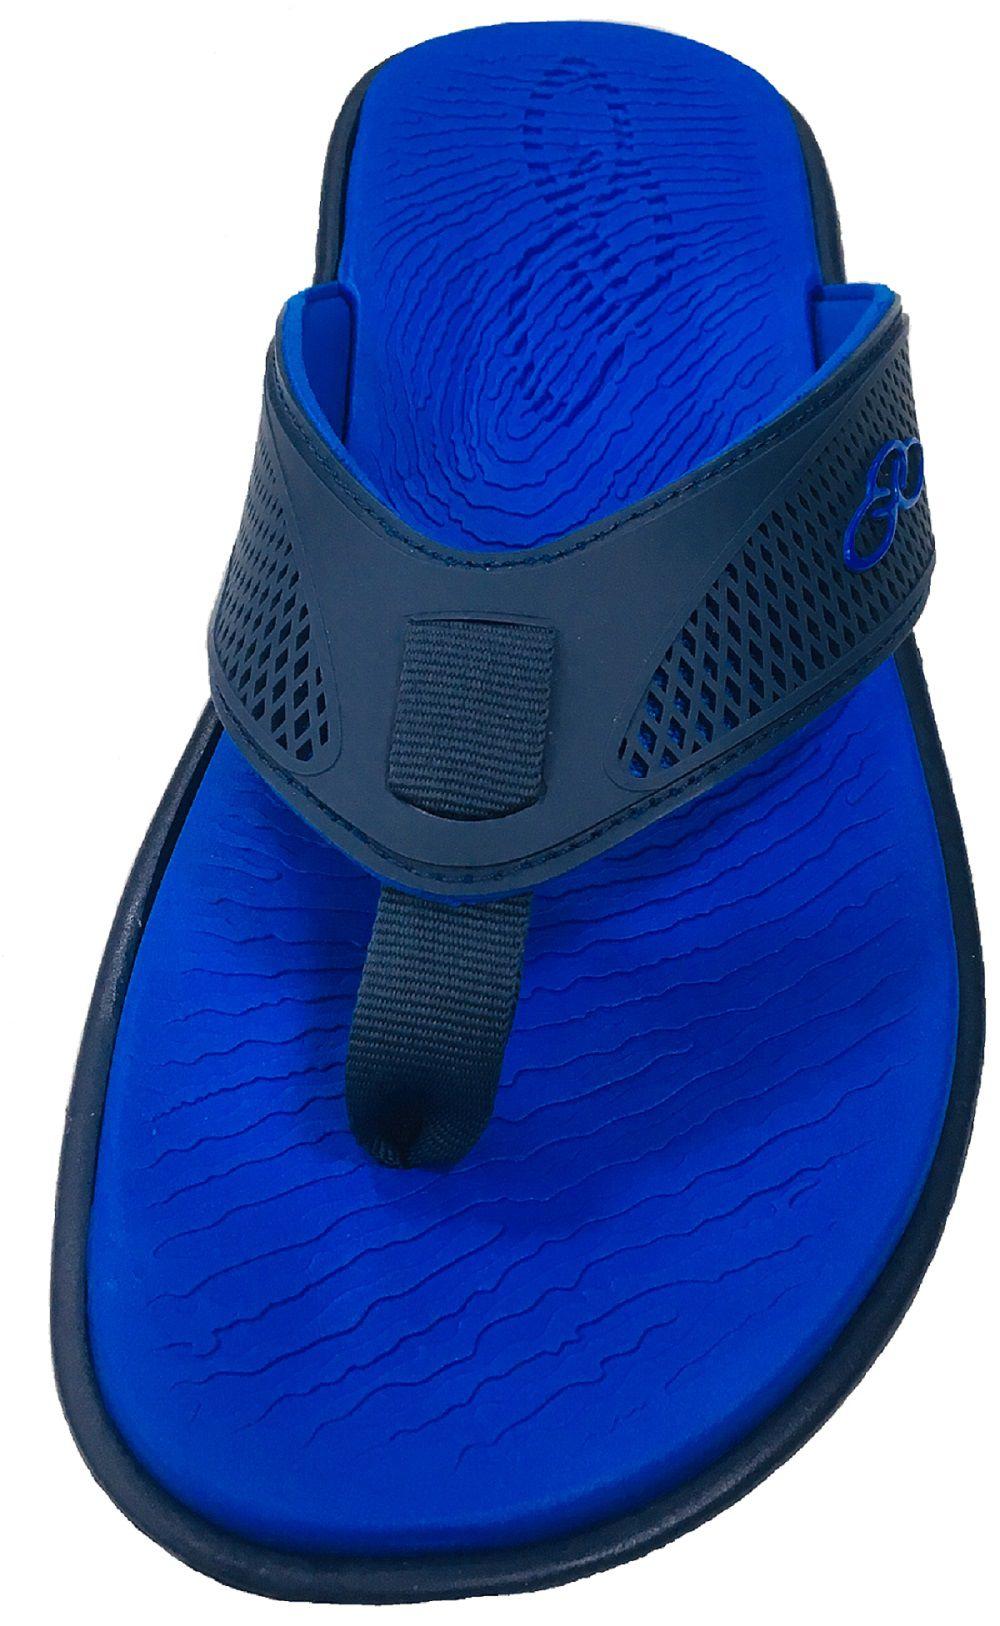 Chinelo Olympikus Ibiza -  Masculino - Azul / Marinho